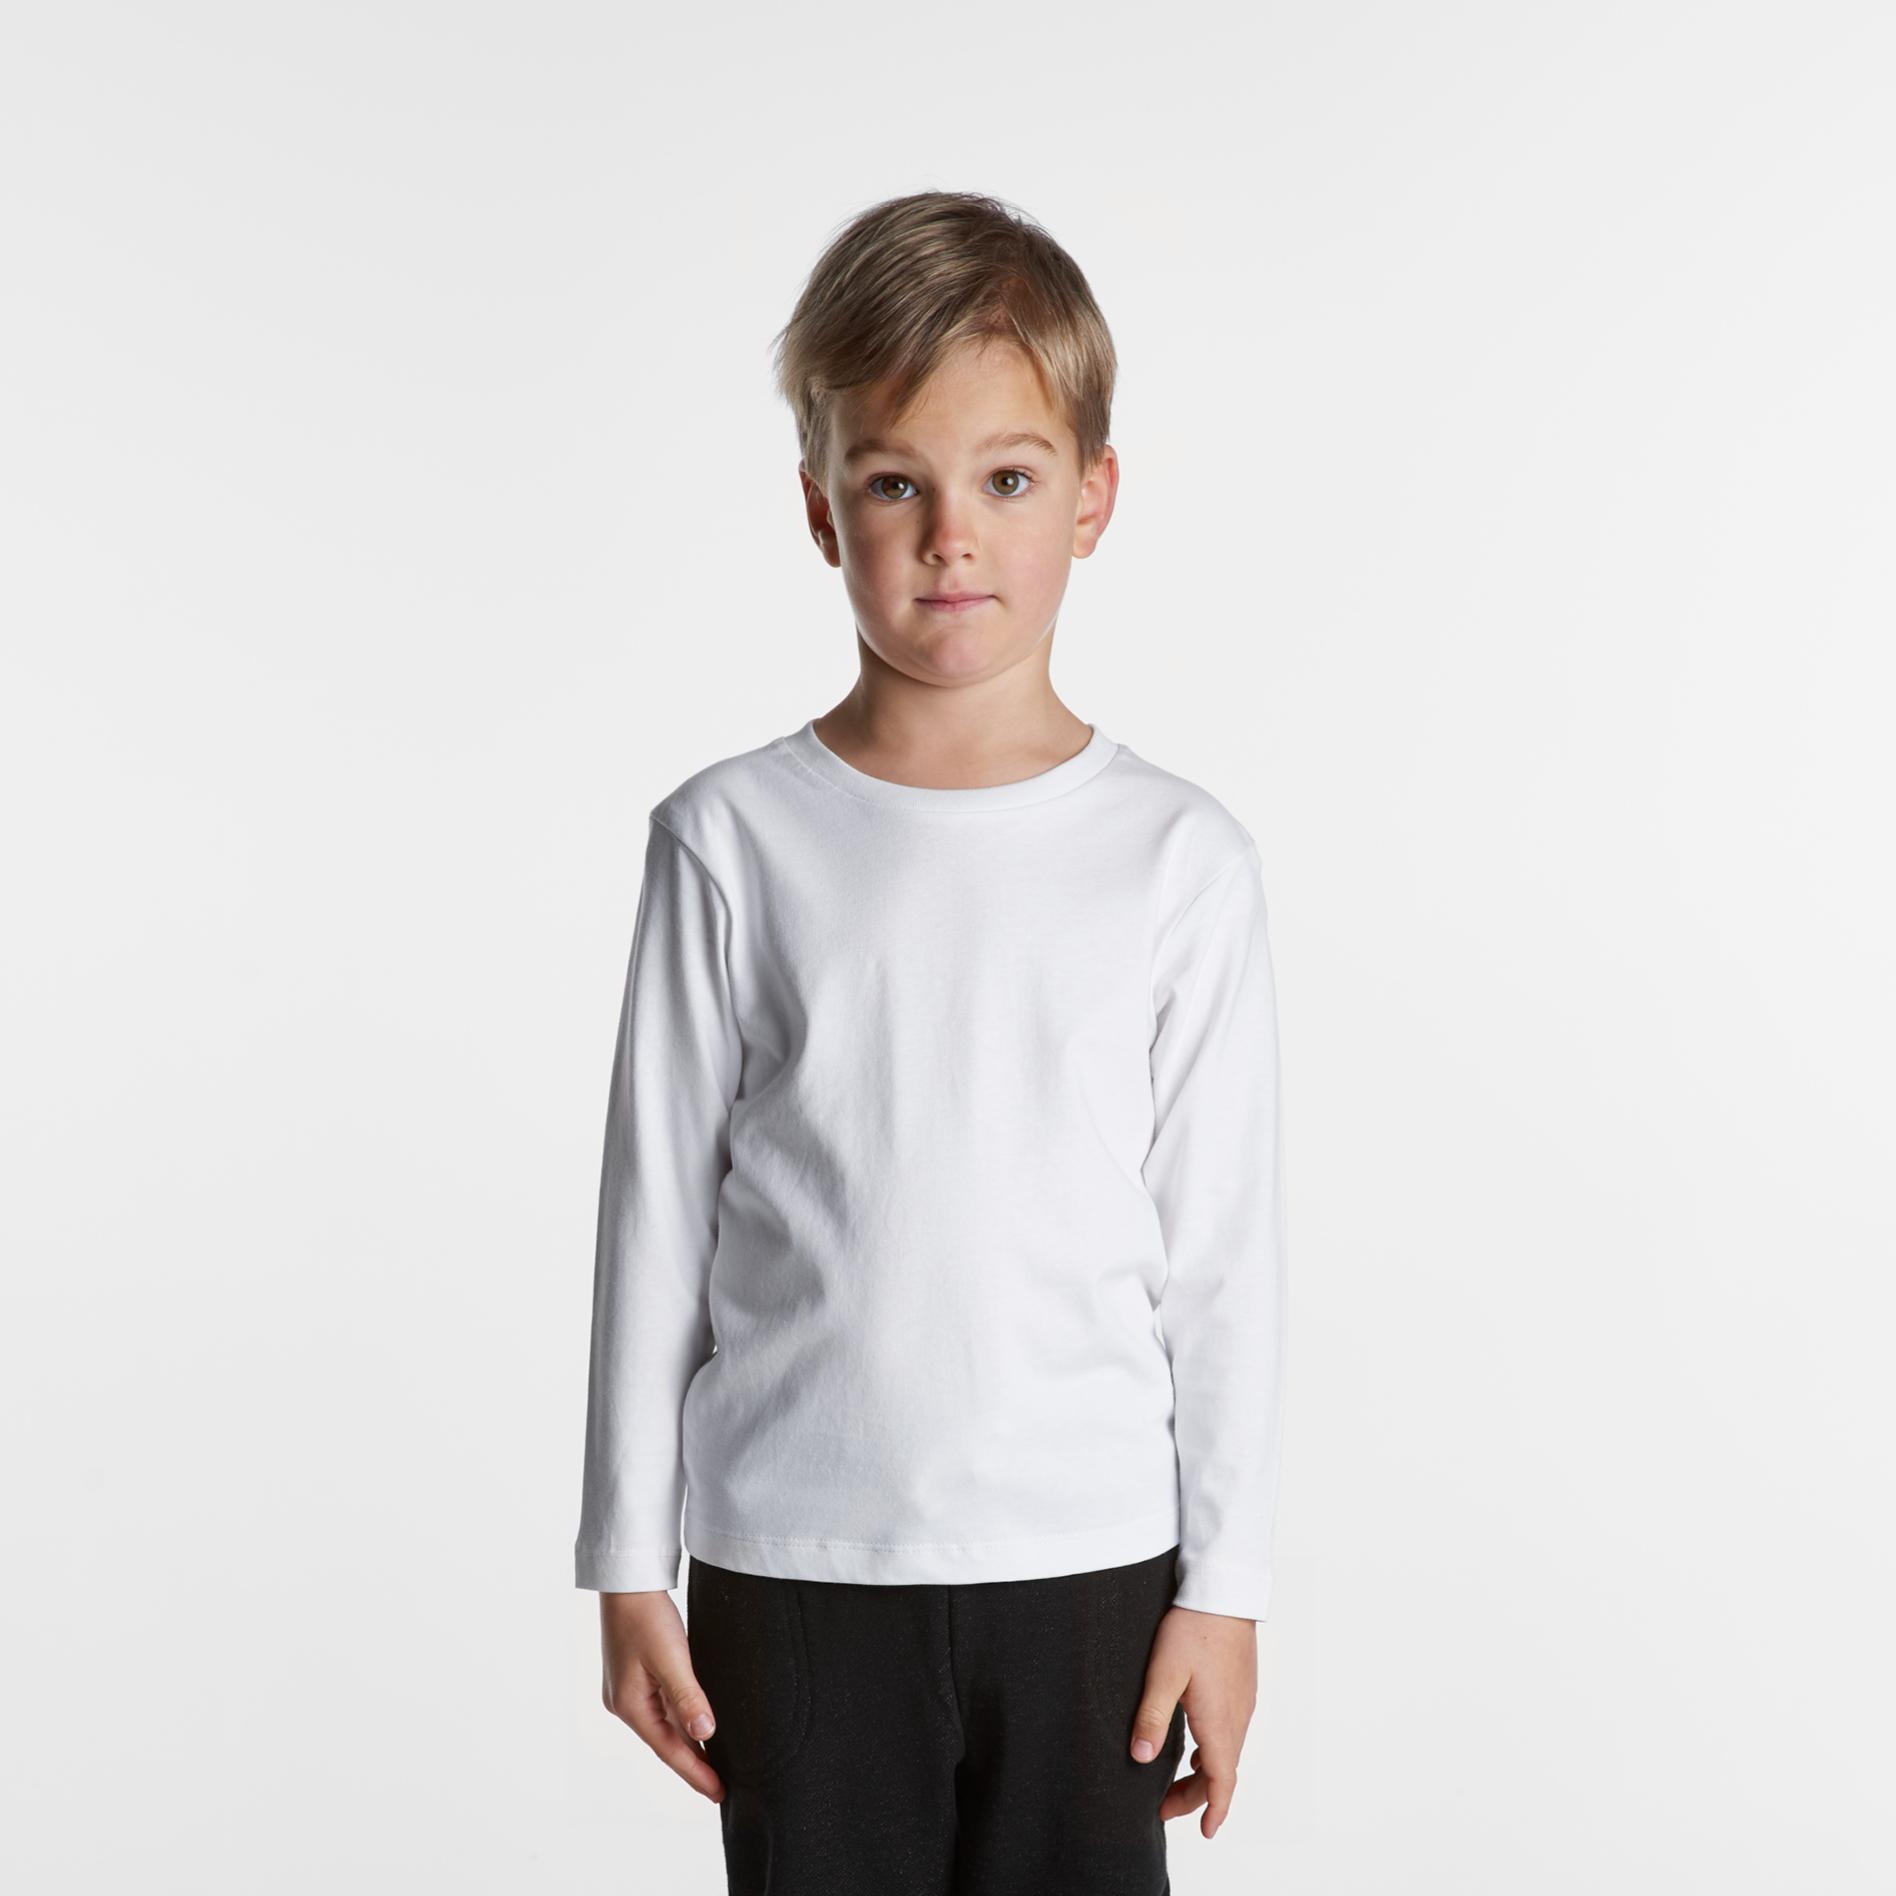 AS Colour Kids Long Sleeve Tee